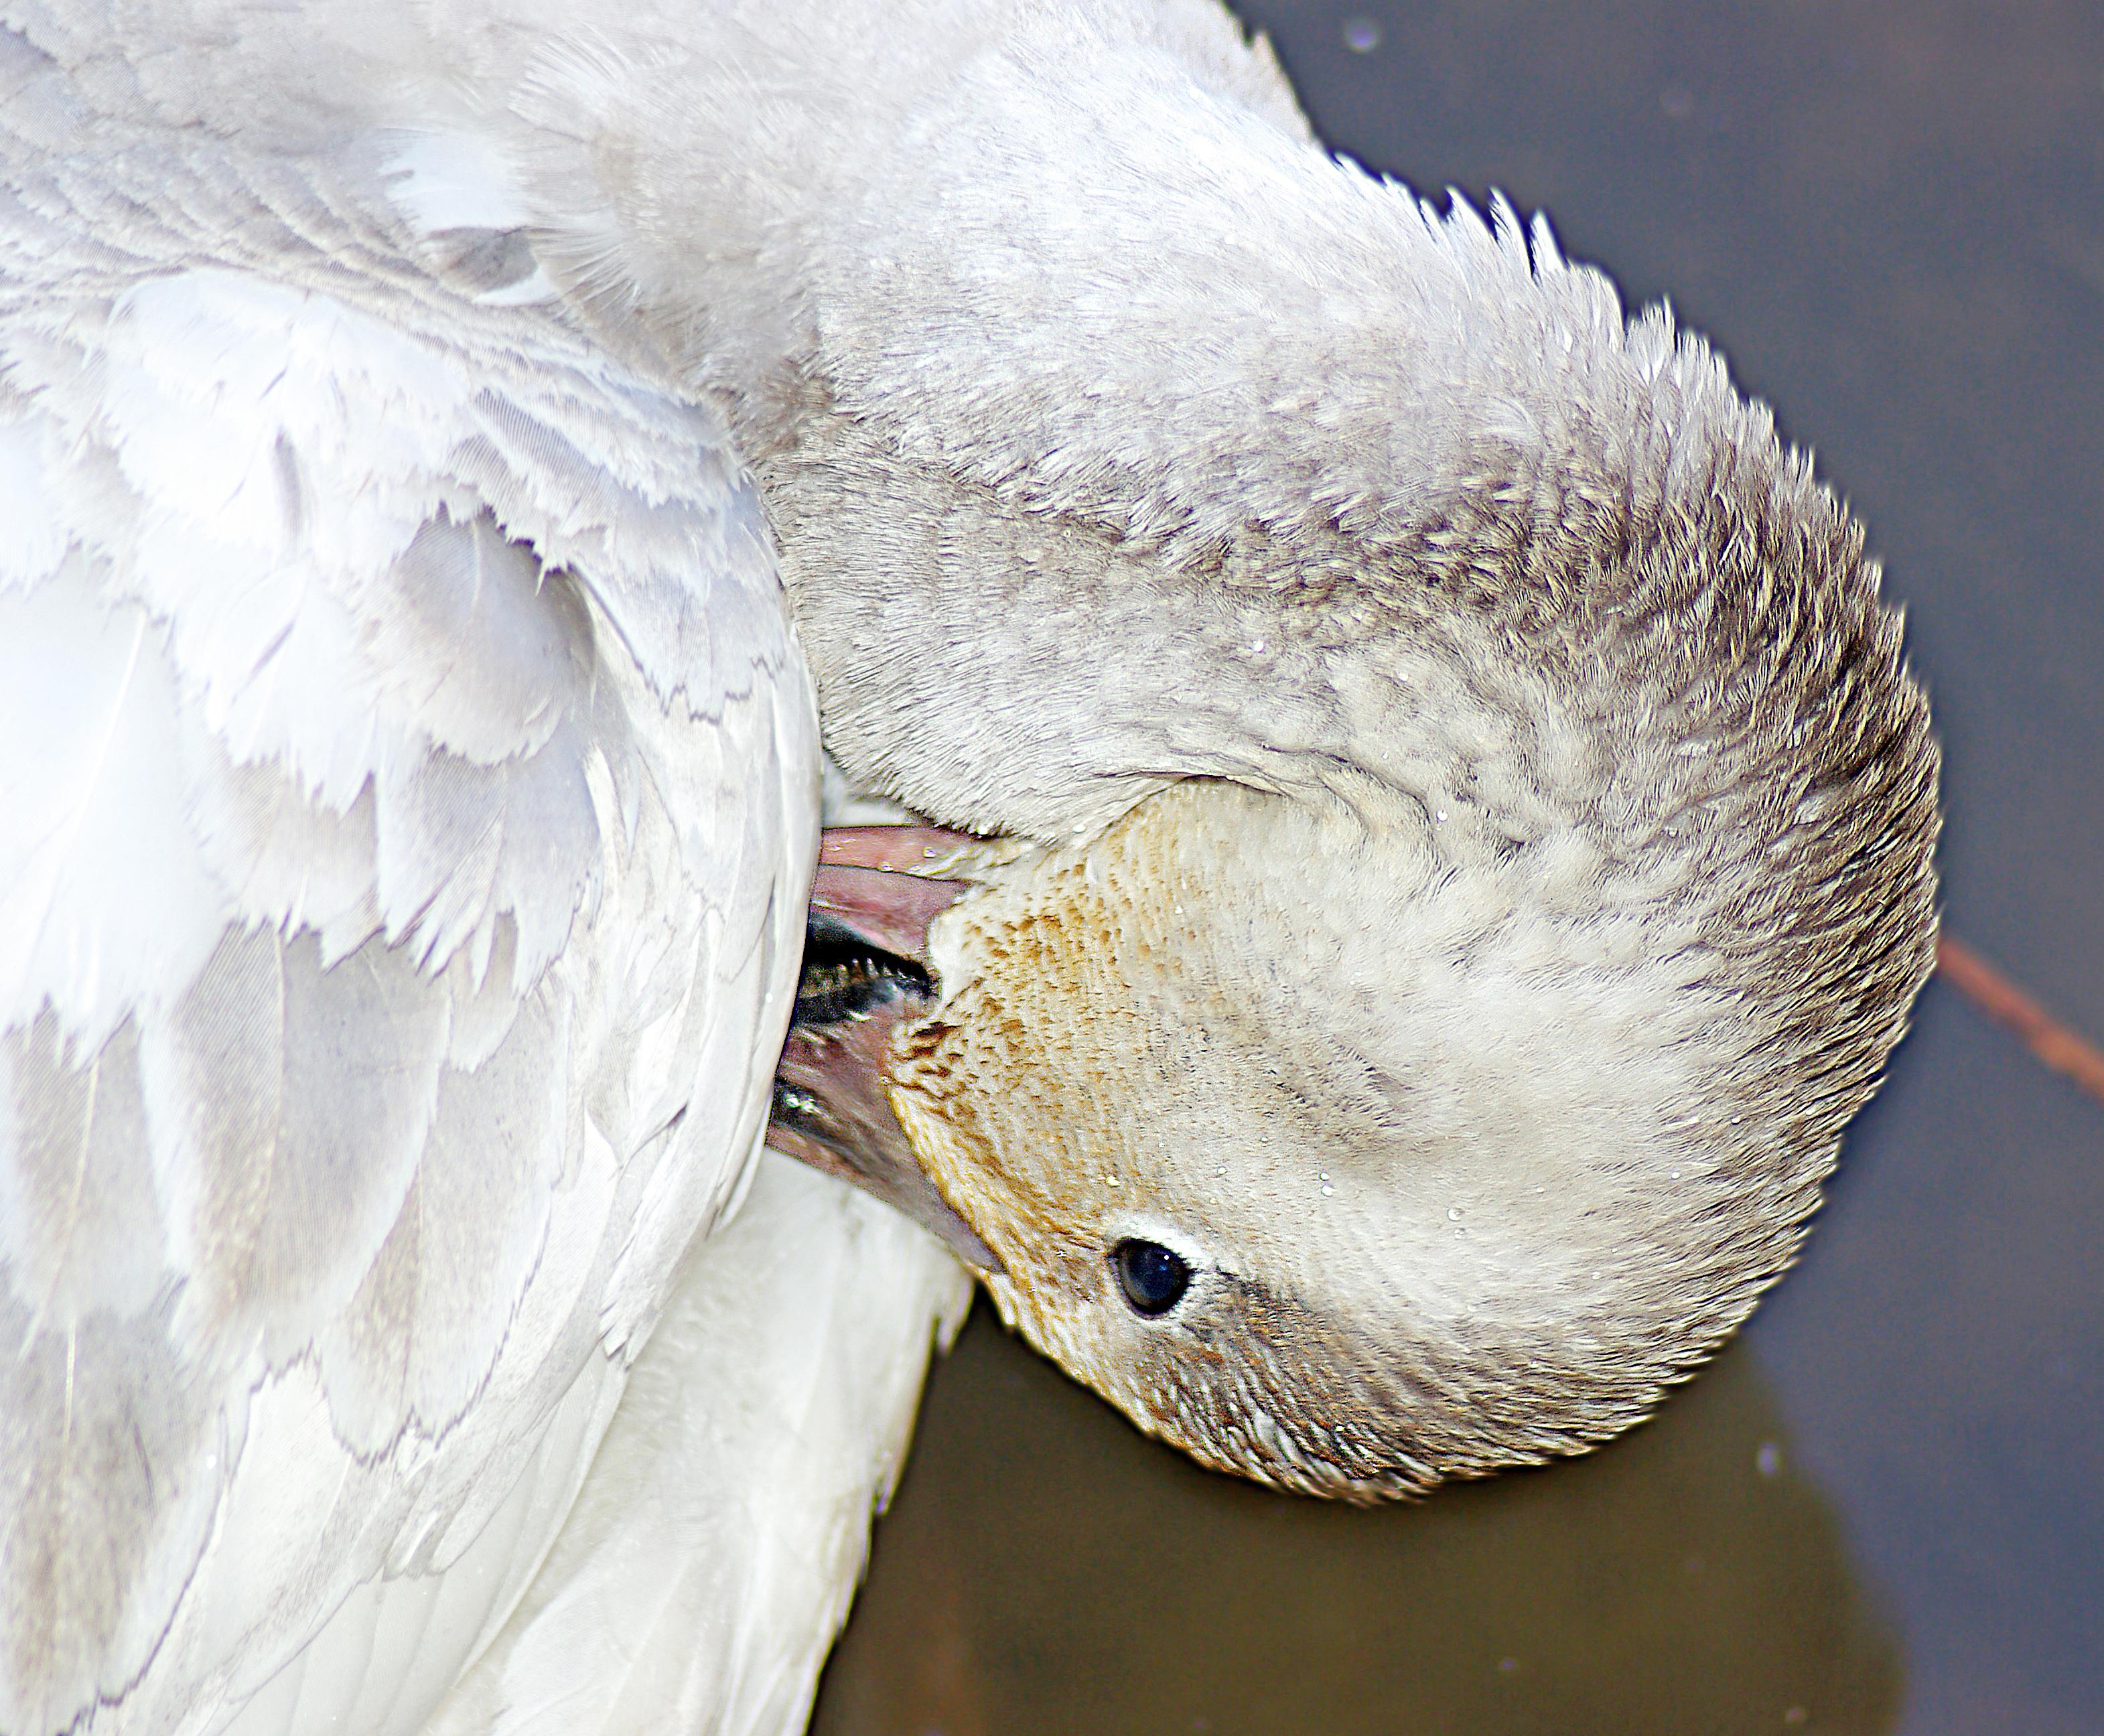 012 - snow goose (1-6-07) cloisters, sloco, ca (3) photo